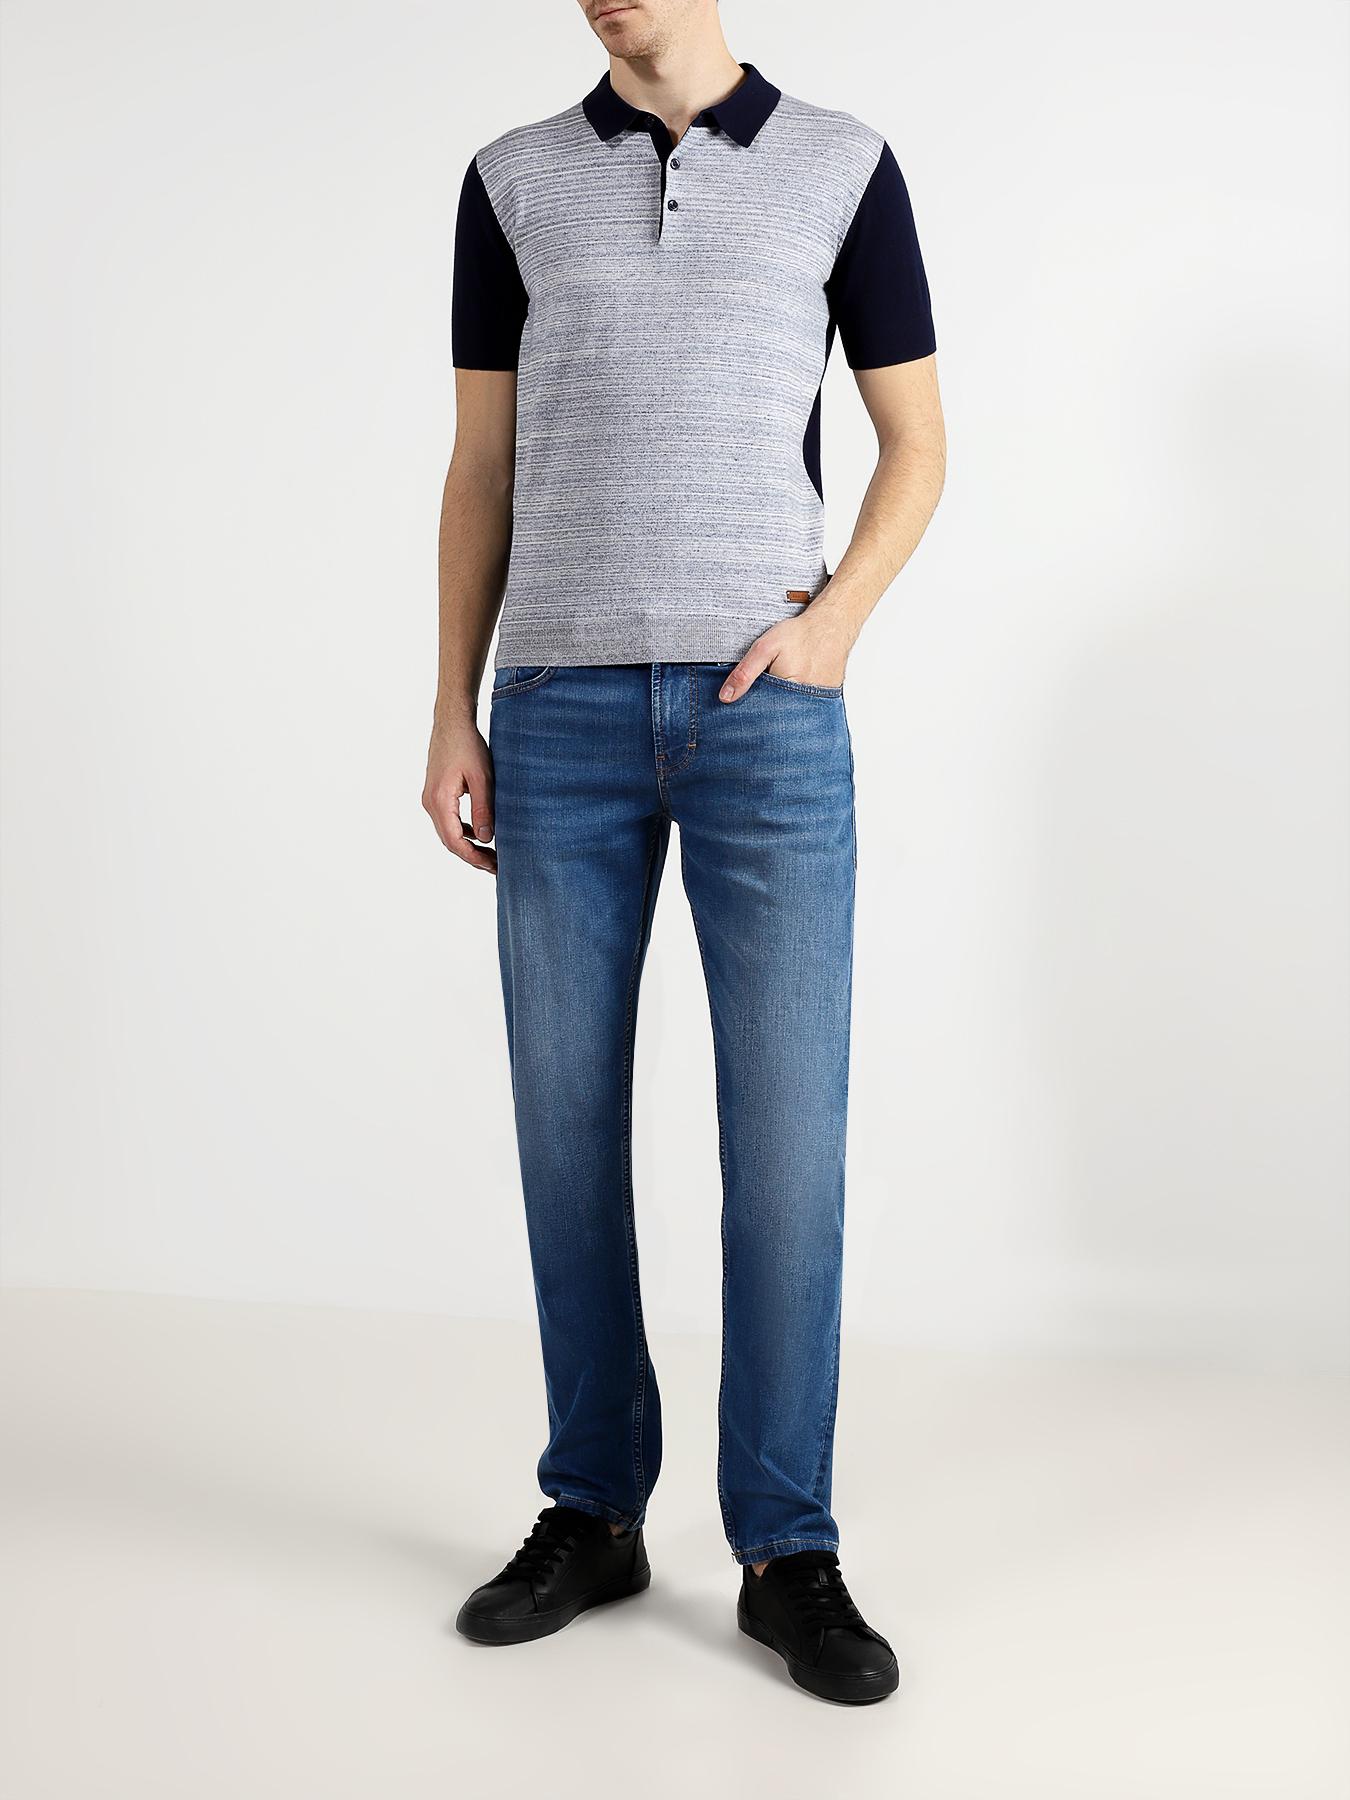 Alessandro Manzoni Jeans Поло фото